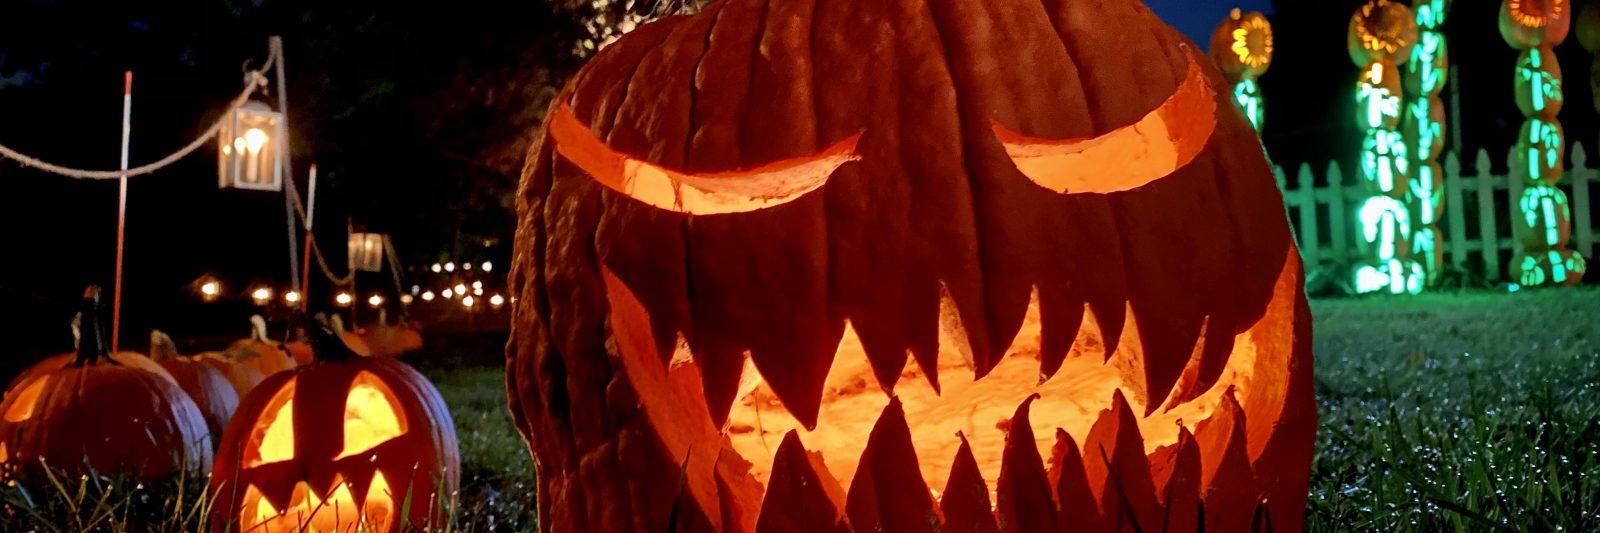 Illuminated jack o'lanterns at Pumpkin Blaze.